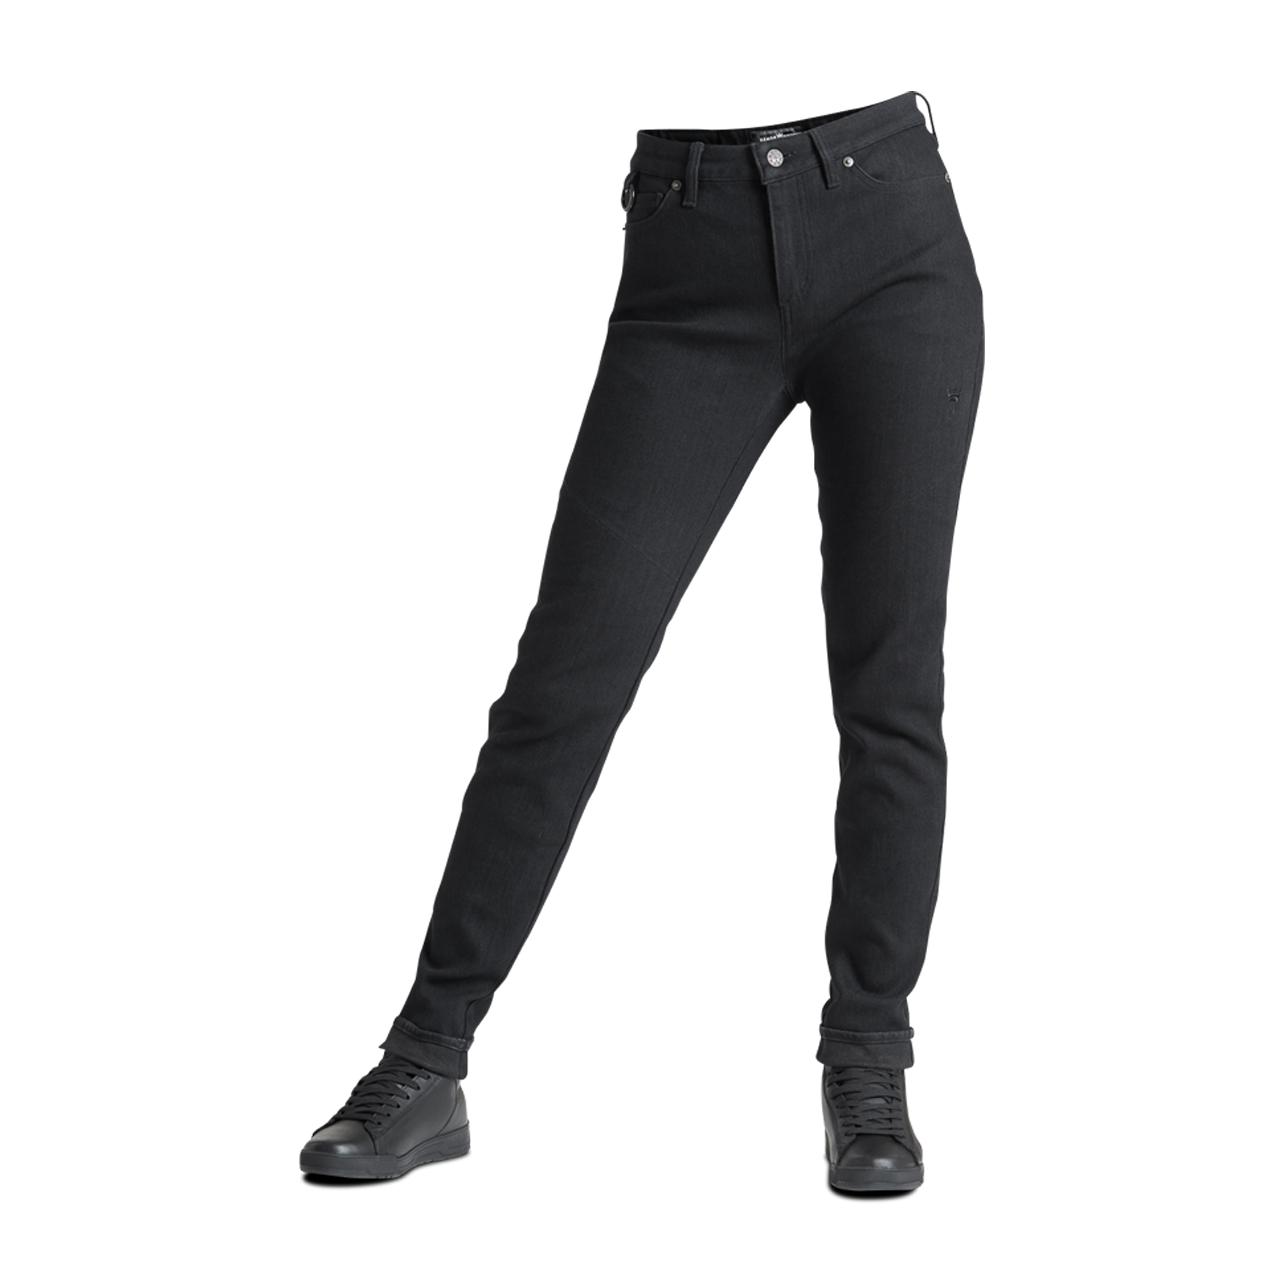 Pando Moto Jean Moto Femme Pando Moto Kissaki Dyn 01 Noir